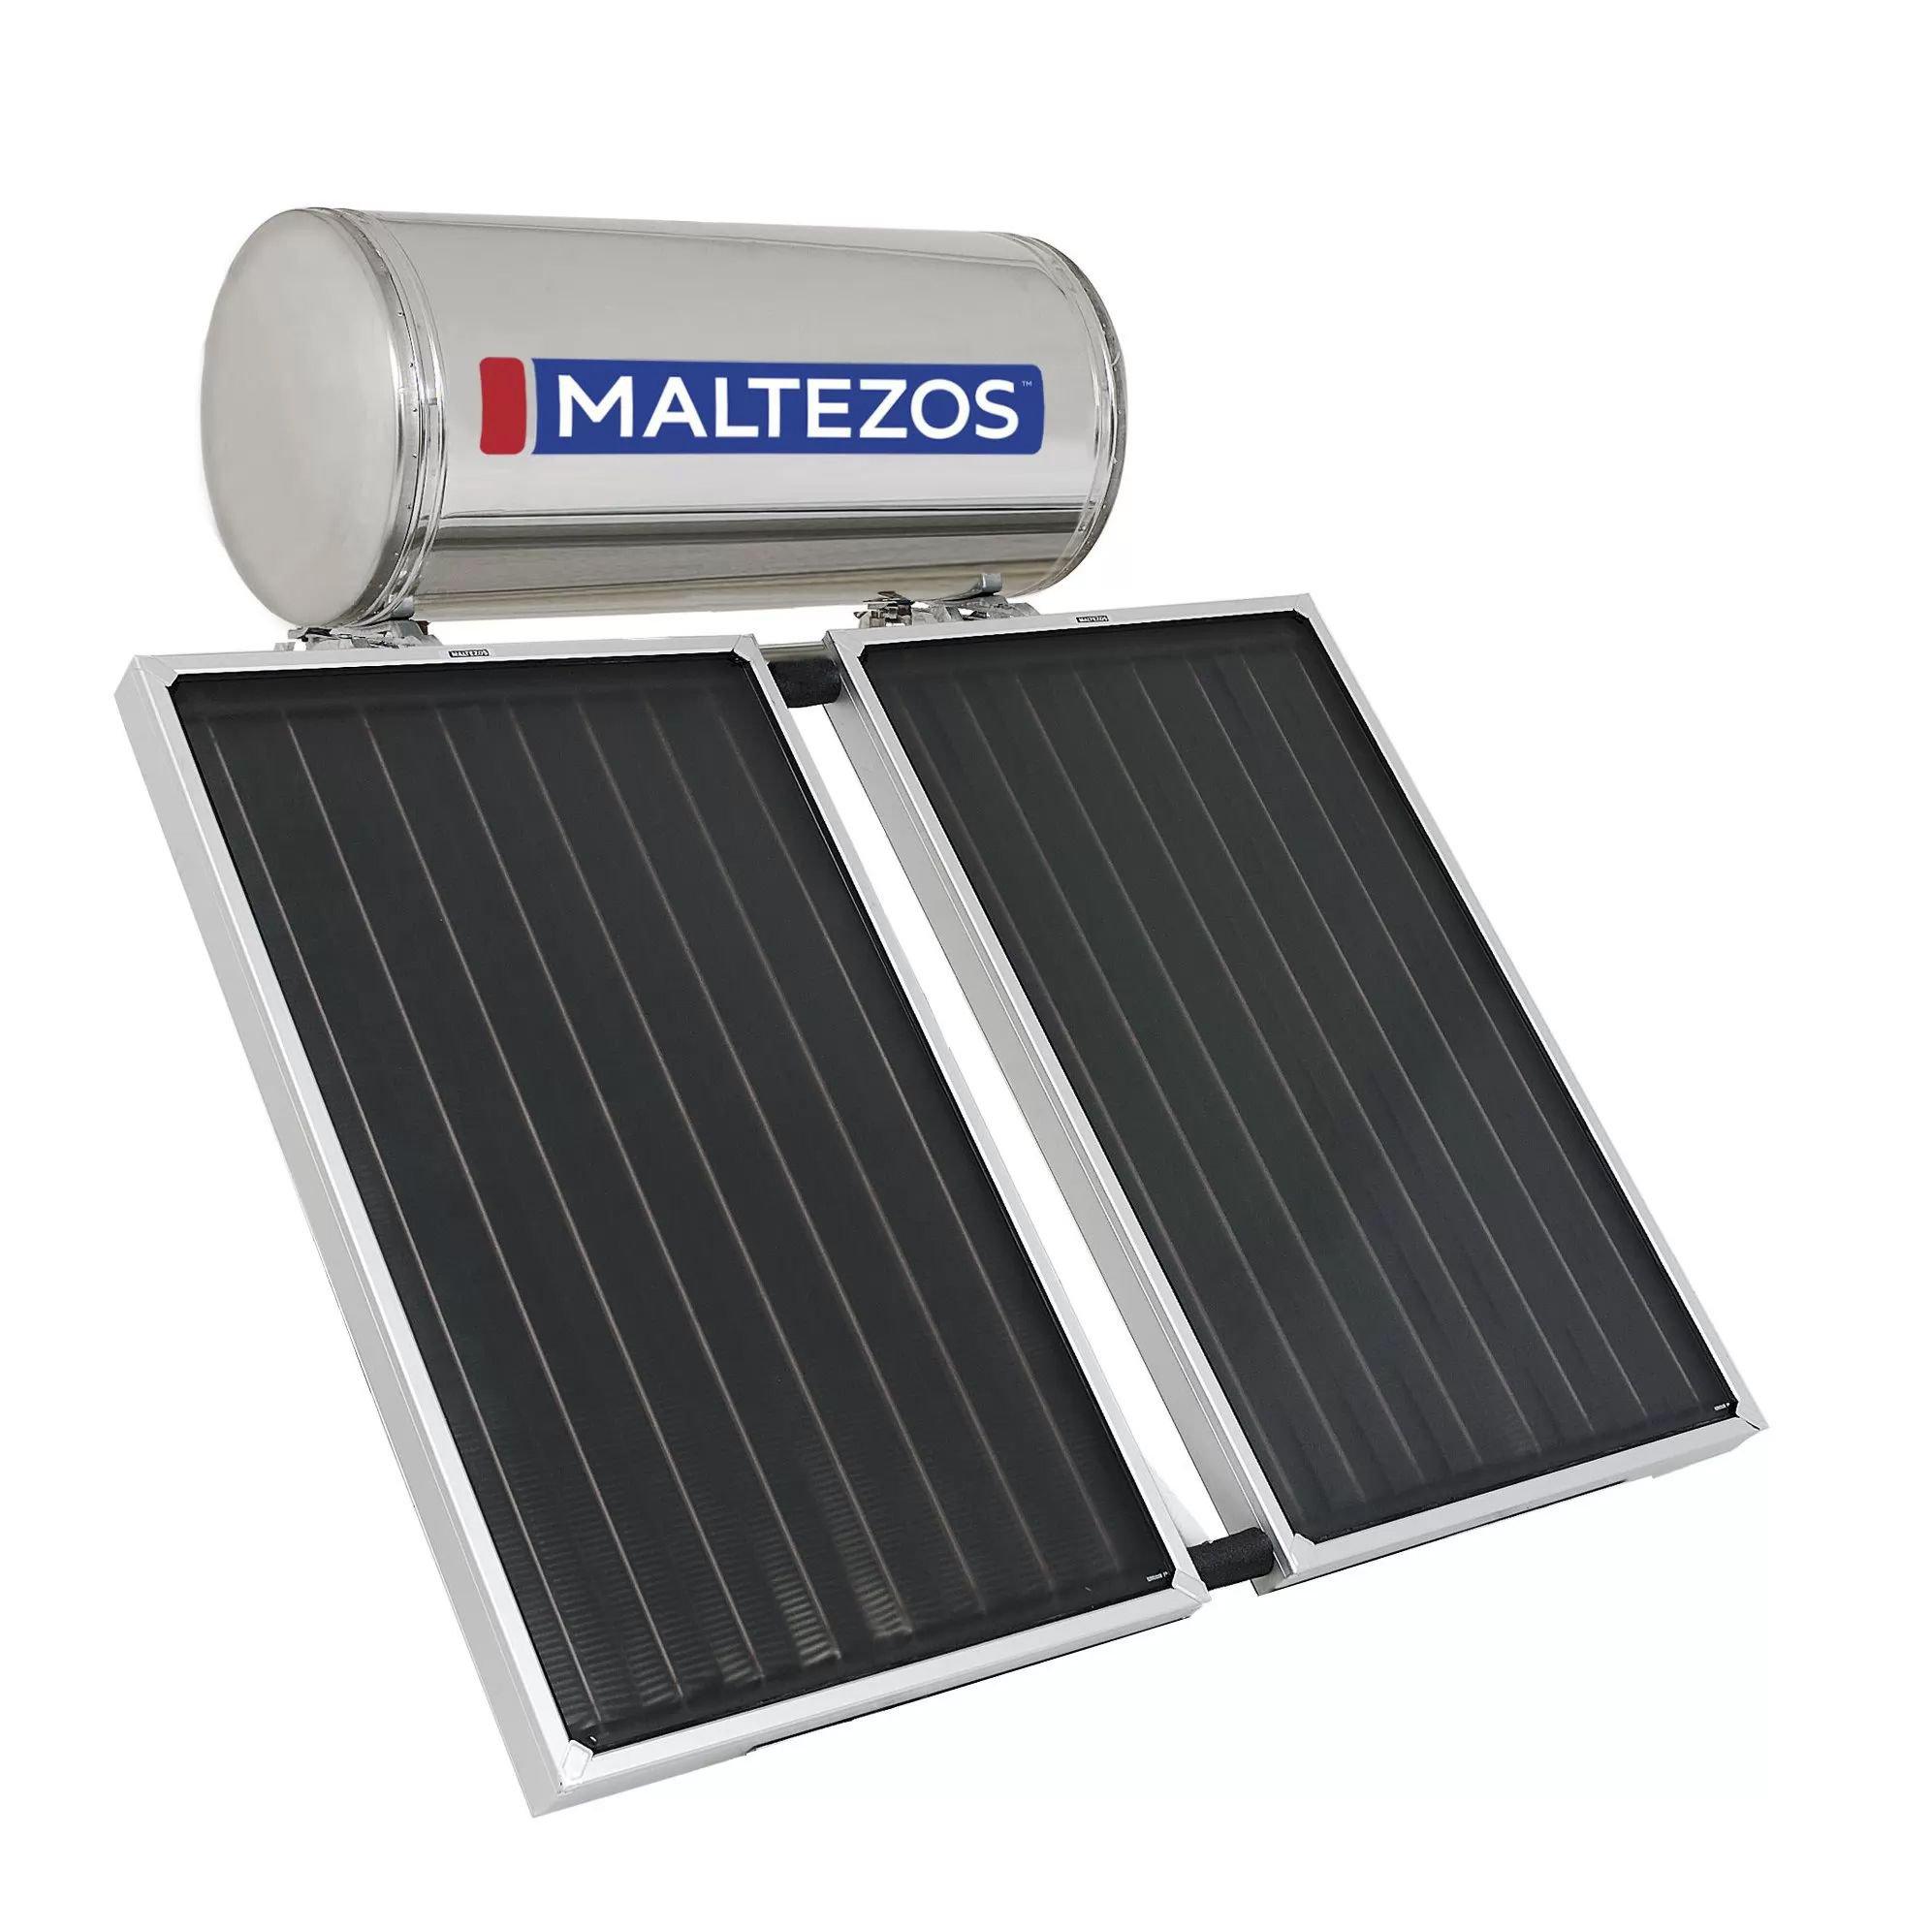 MALTEZOS MALT H 160Lt  INOX Τριπλής Ενεργείας, 2 Επιλεκτικοί Συλλέκτες SAC 90X150 (2.7τμ)